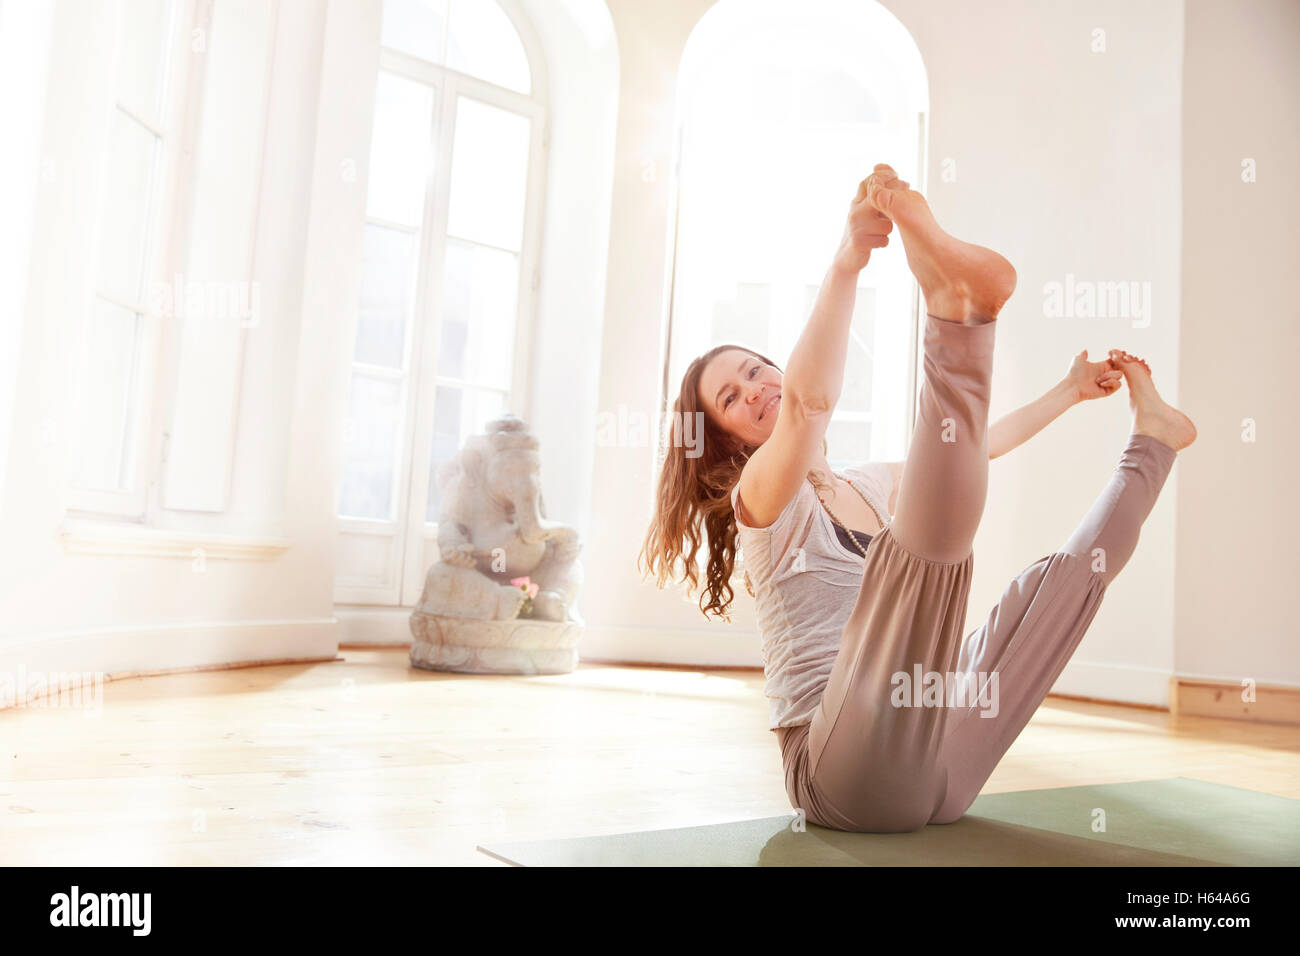 Woman in sunny yoga studio holding an extended Navasana pose - Stock Image